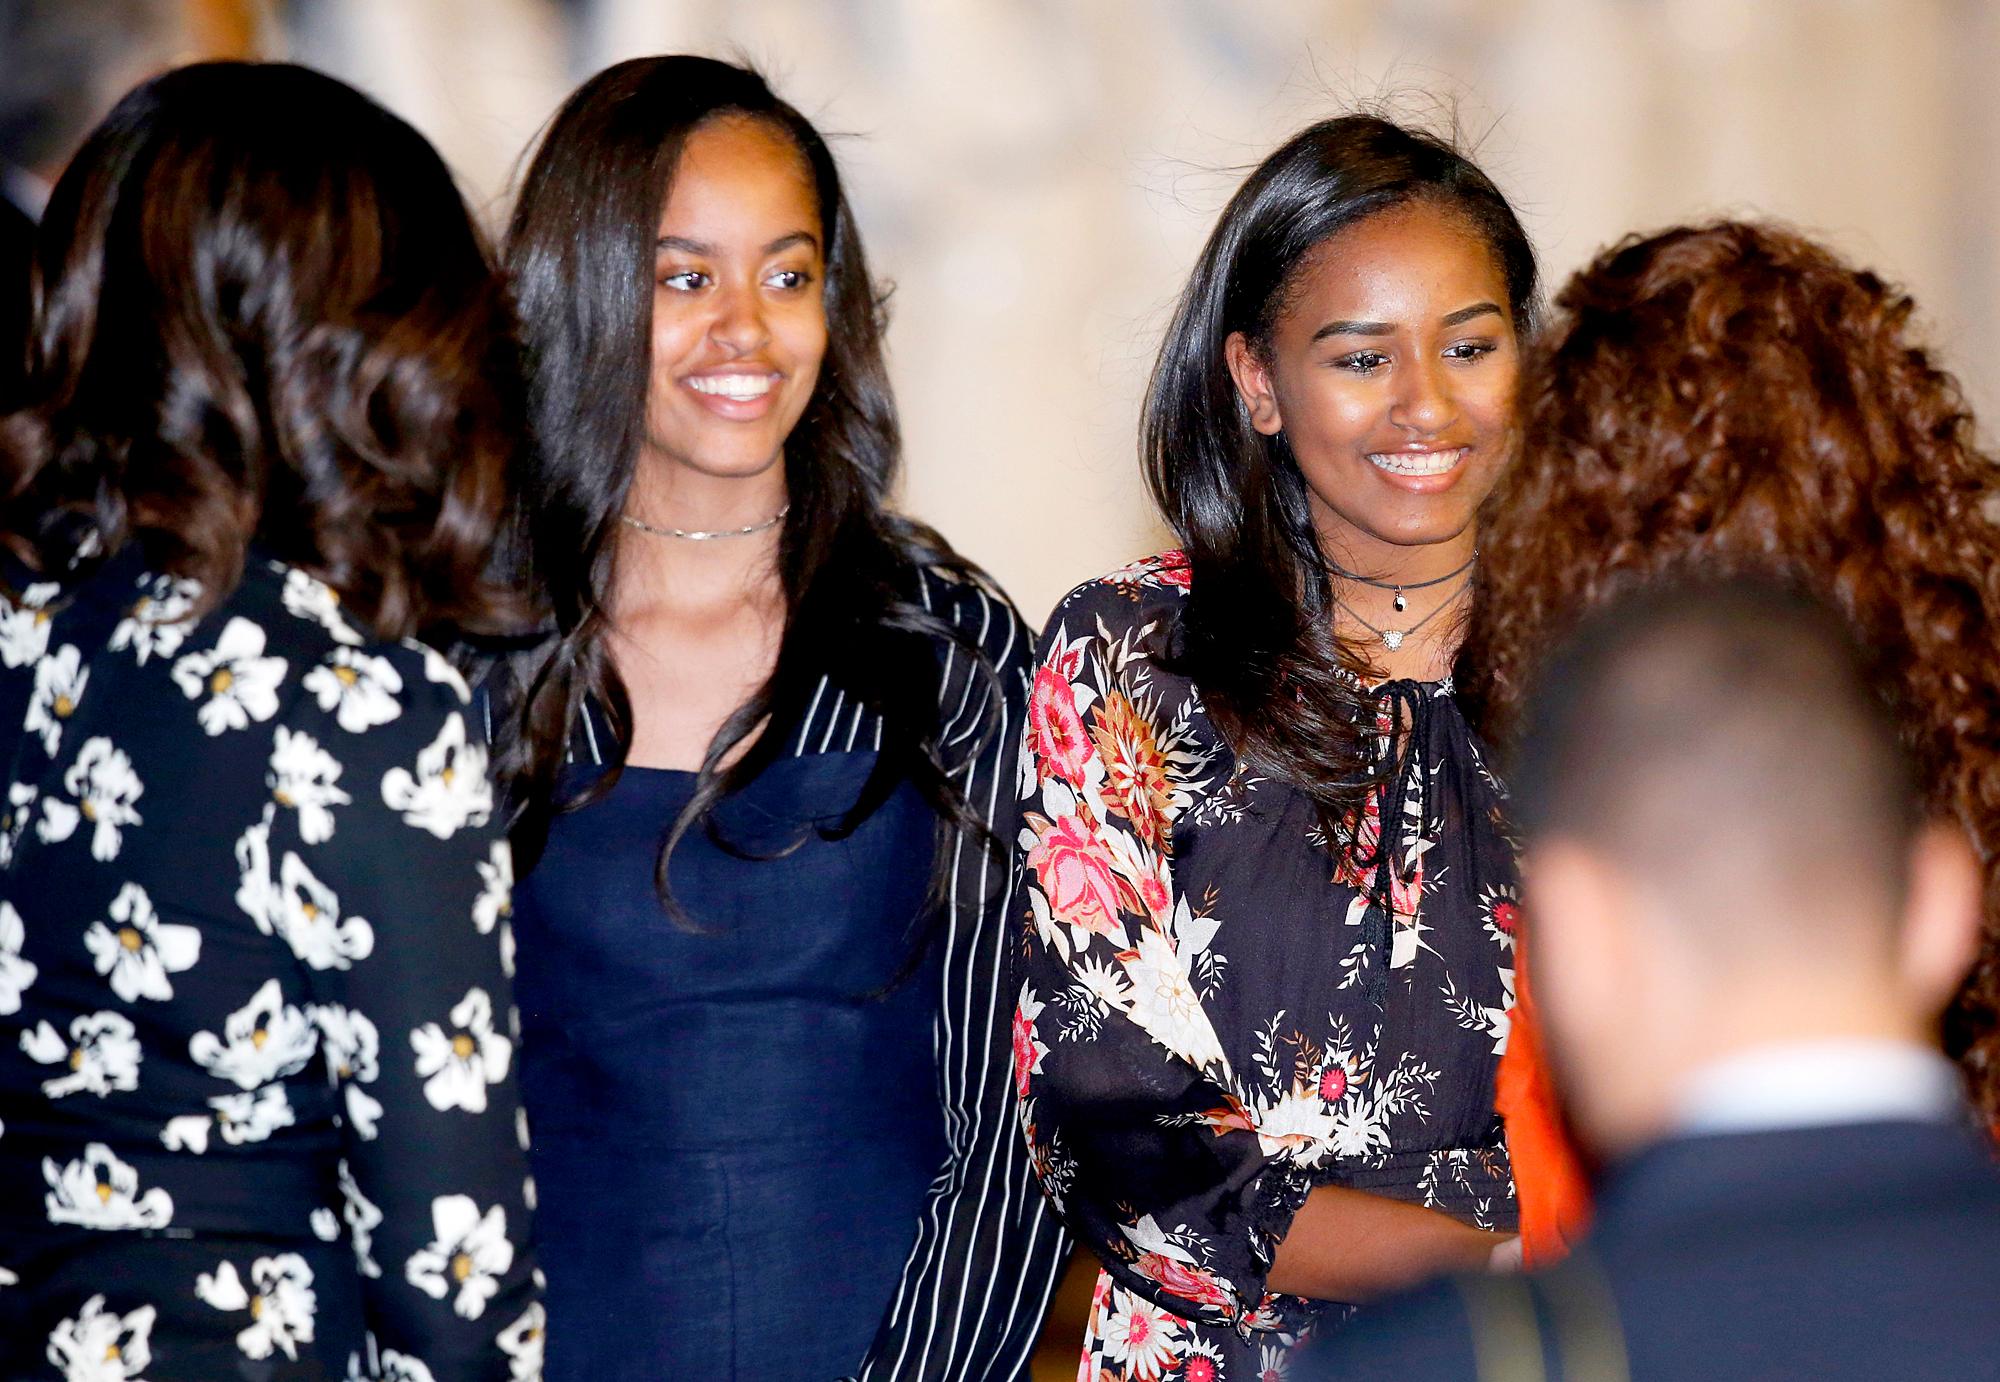 Malia Obama and Sasha Obama